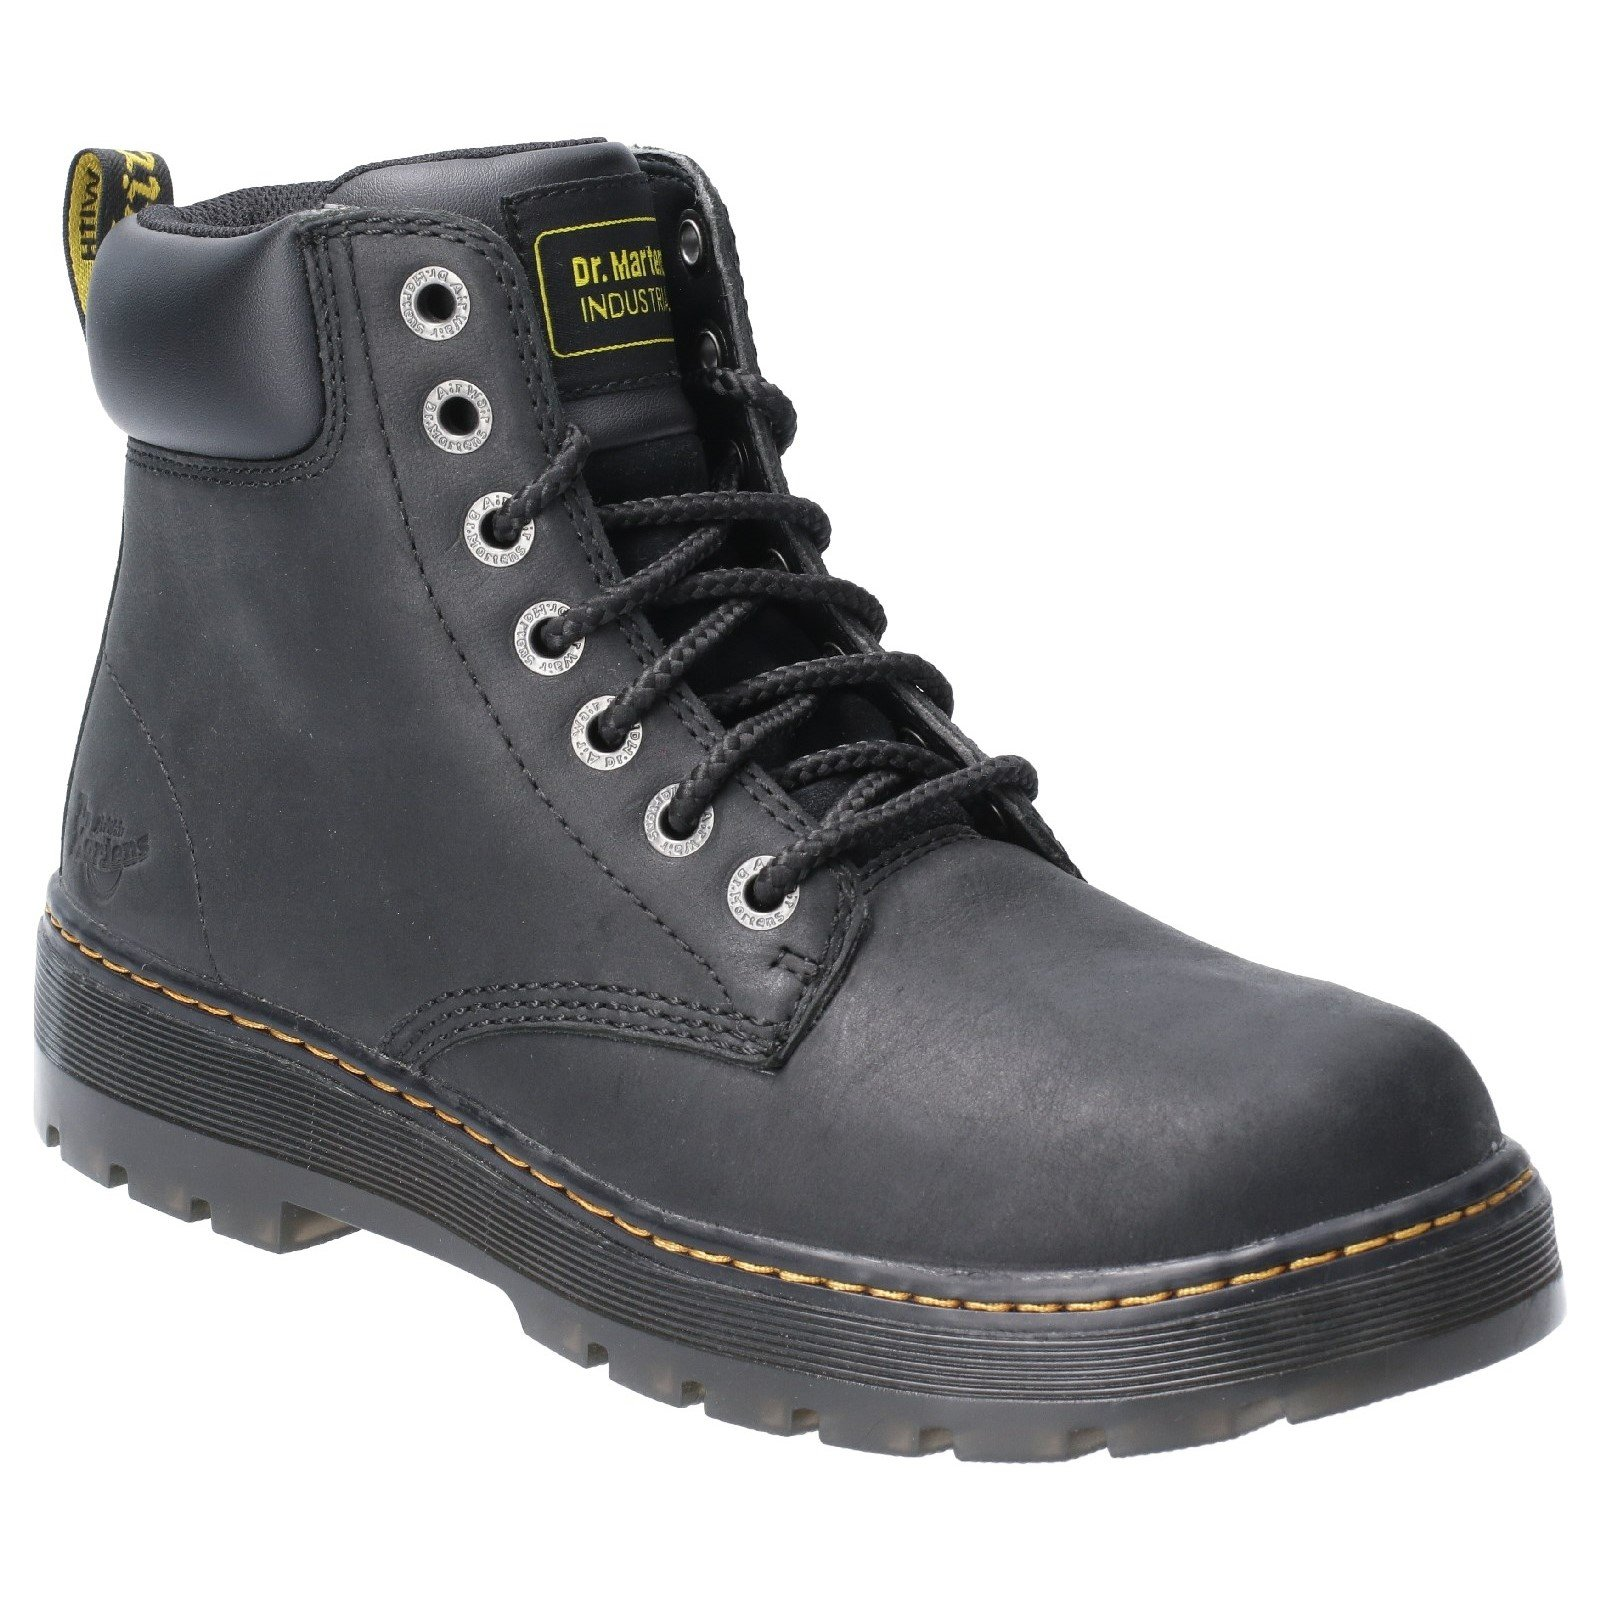 Dr Martens Men's Winch Non-Safety Work Boot Black 29821 - Black 7